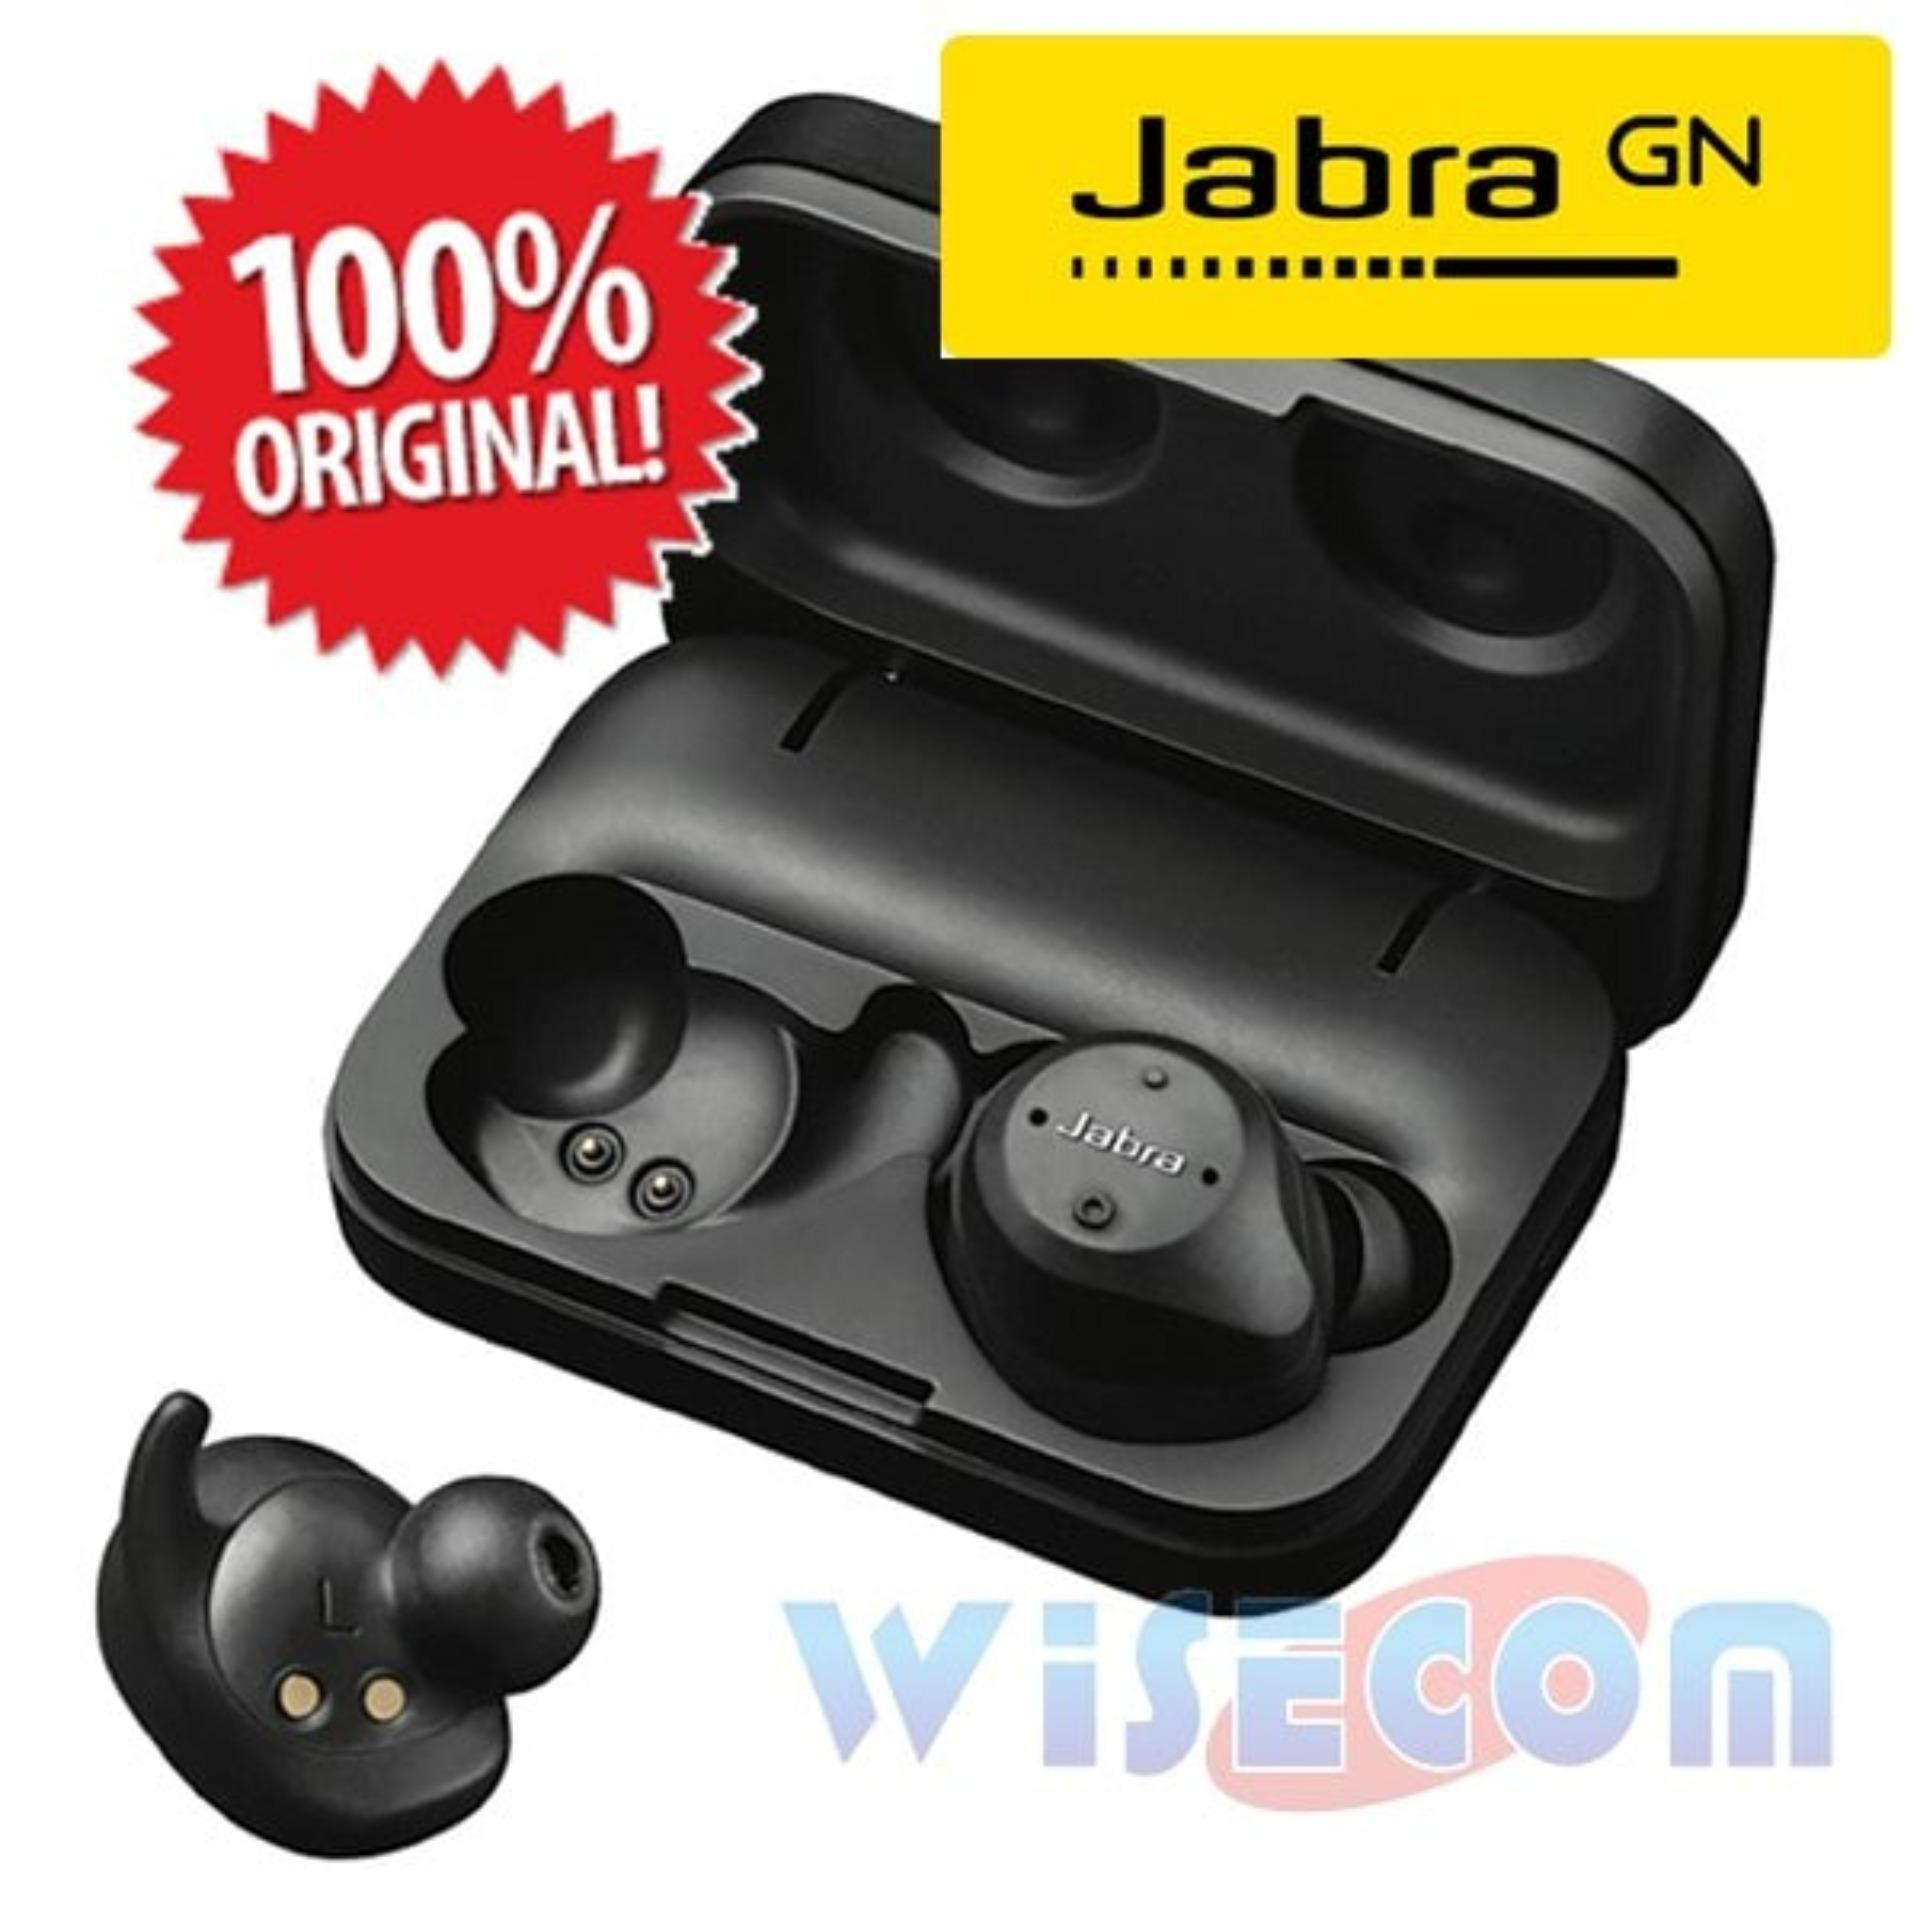 Jabra Elite Sport True Wireless Waterproof Fitness EarbudsORIGINAL!